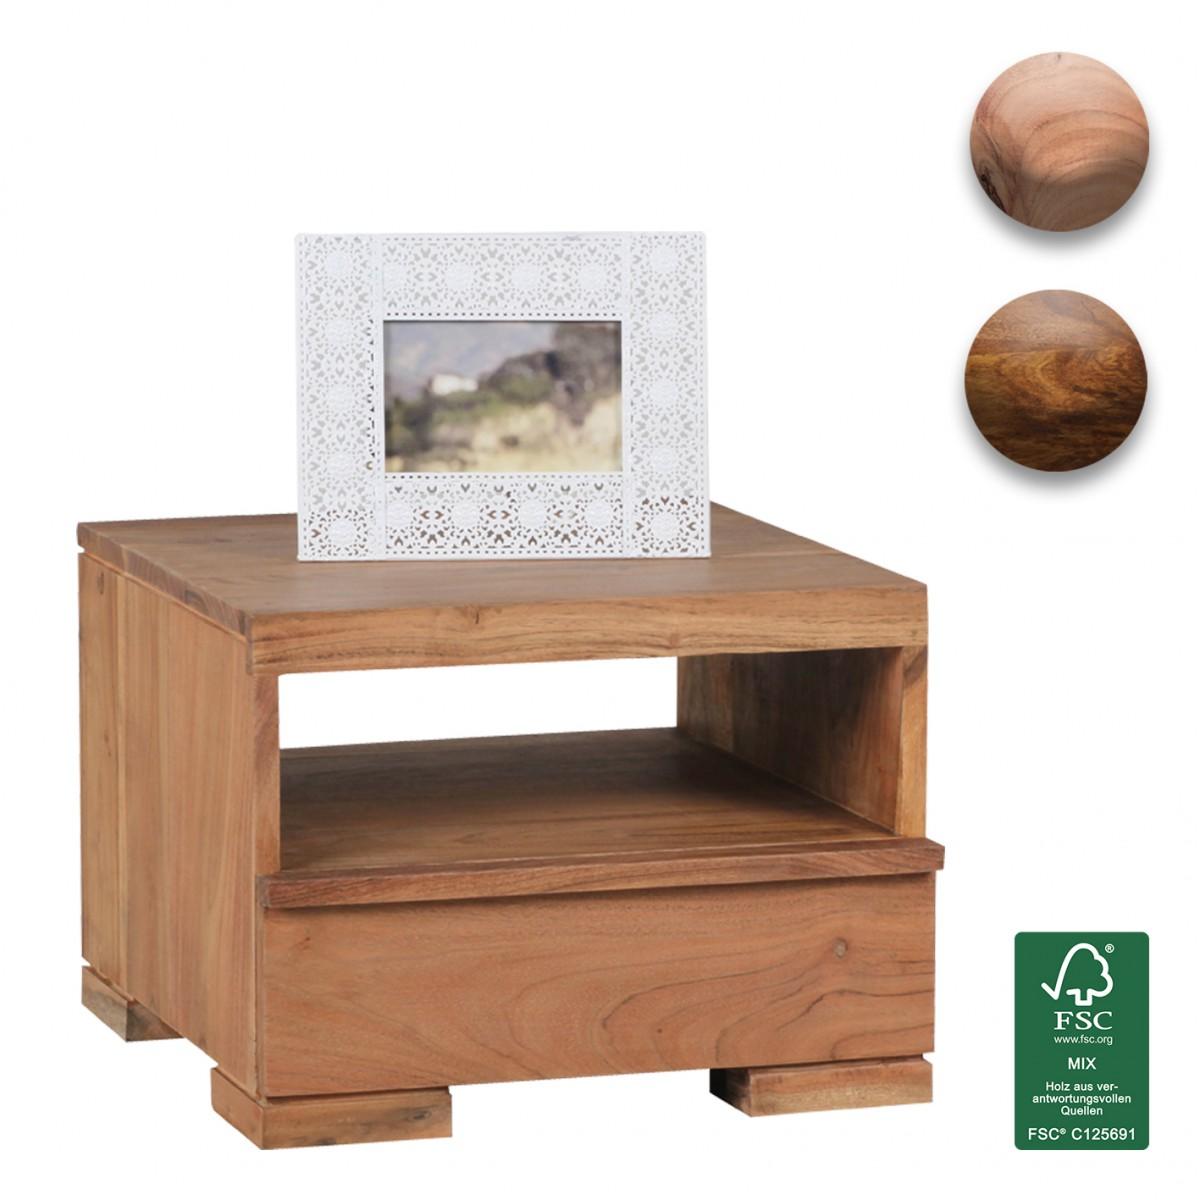 Finebuy madera maciza mesa de noche 30 cm estilo de pa s for Mesillas de noche 30 cm